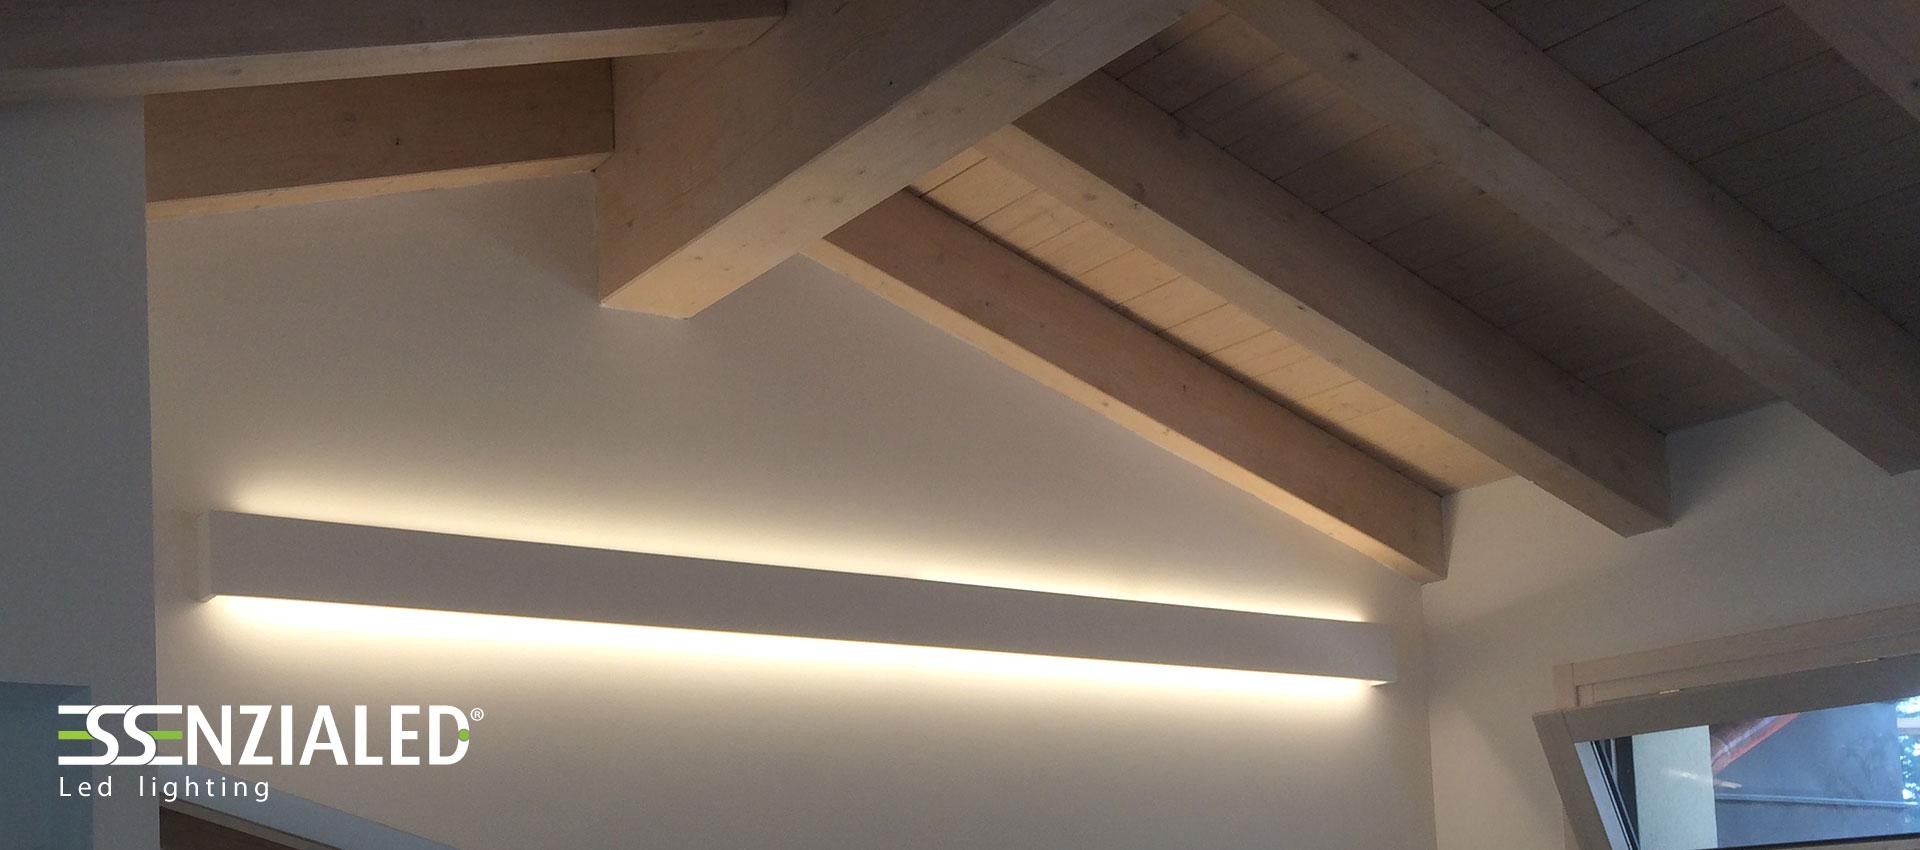 Lampada Faretti Led: Faretti led philips soffitto cinnabar myliving lampada da.